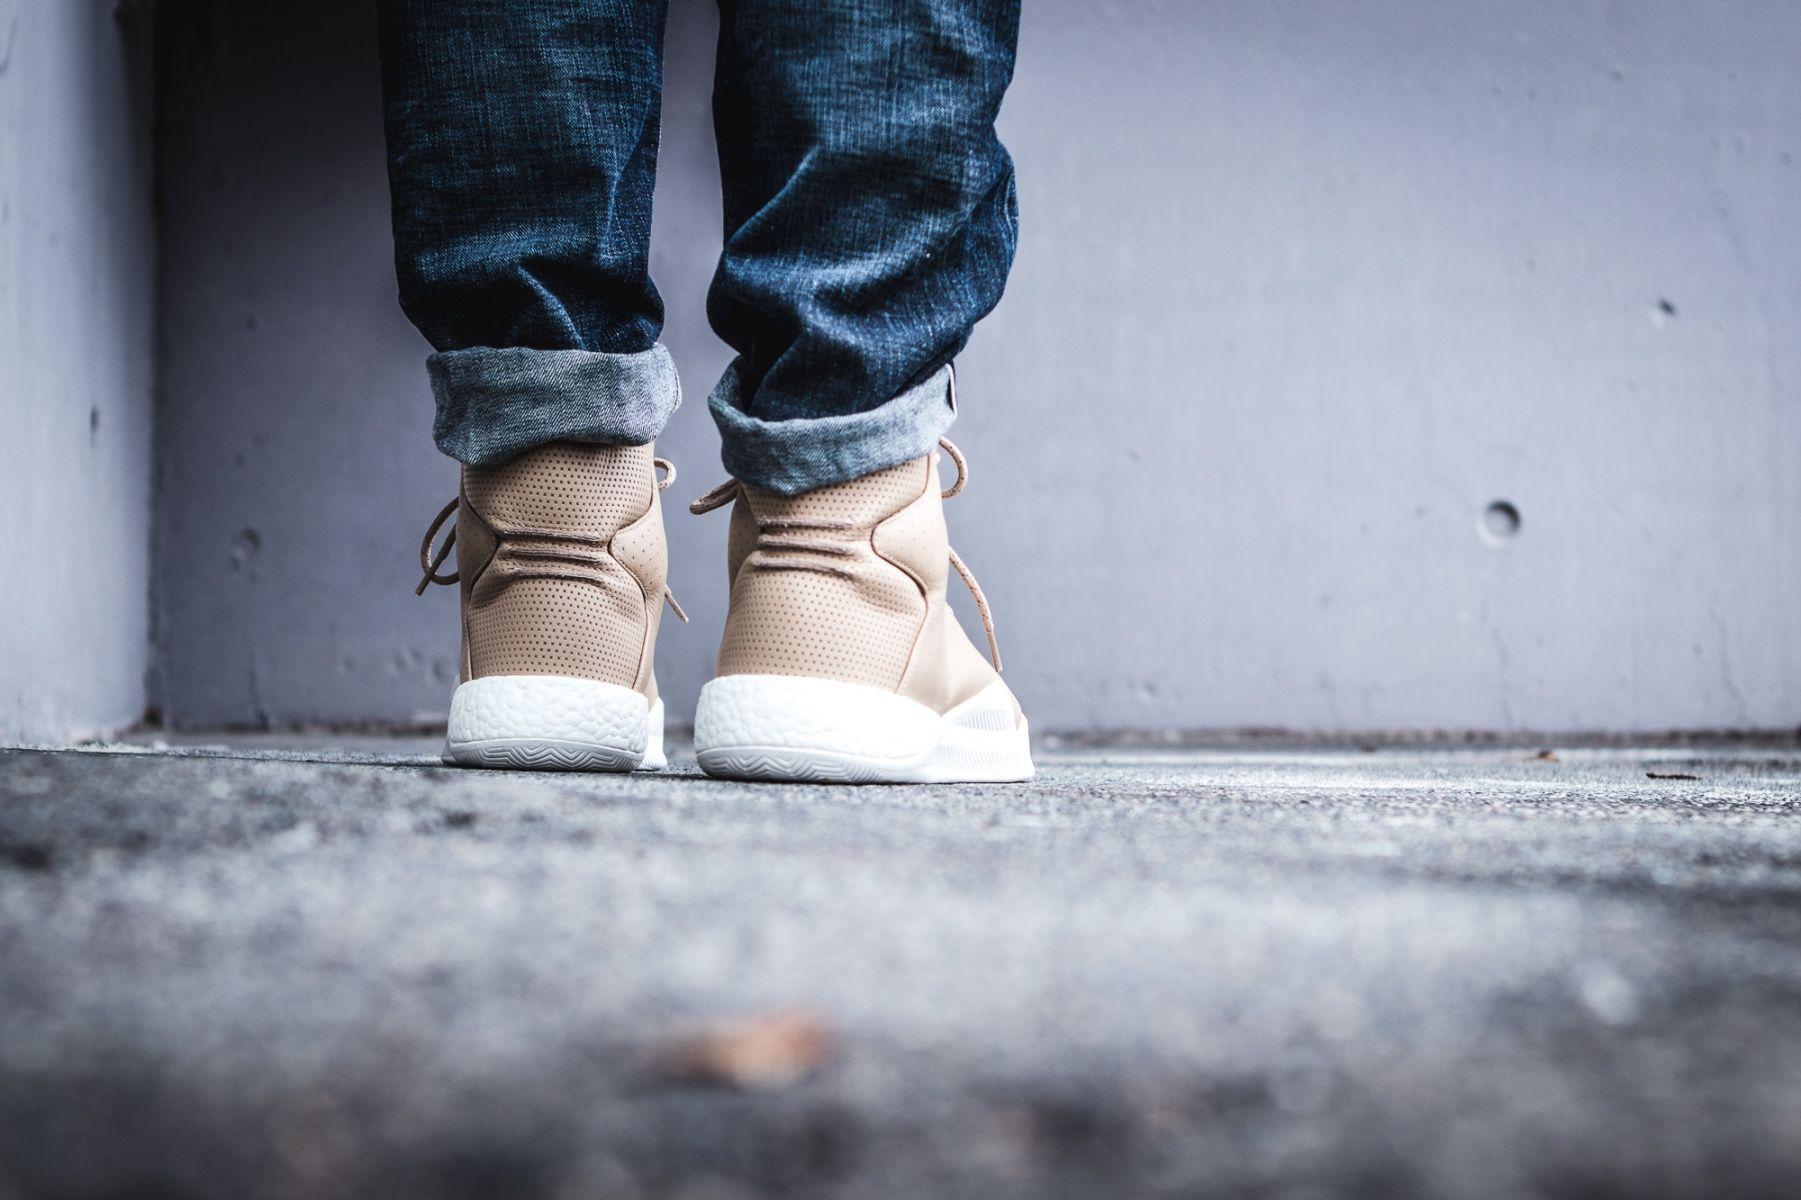 quality design c1bb9 5b7f3 adidas Tubular Instict Boost (hellbraun) - BB8400  43einhalb sneaker store